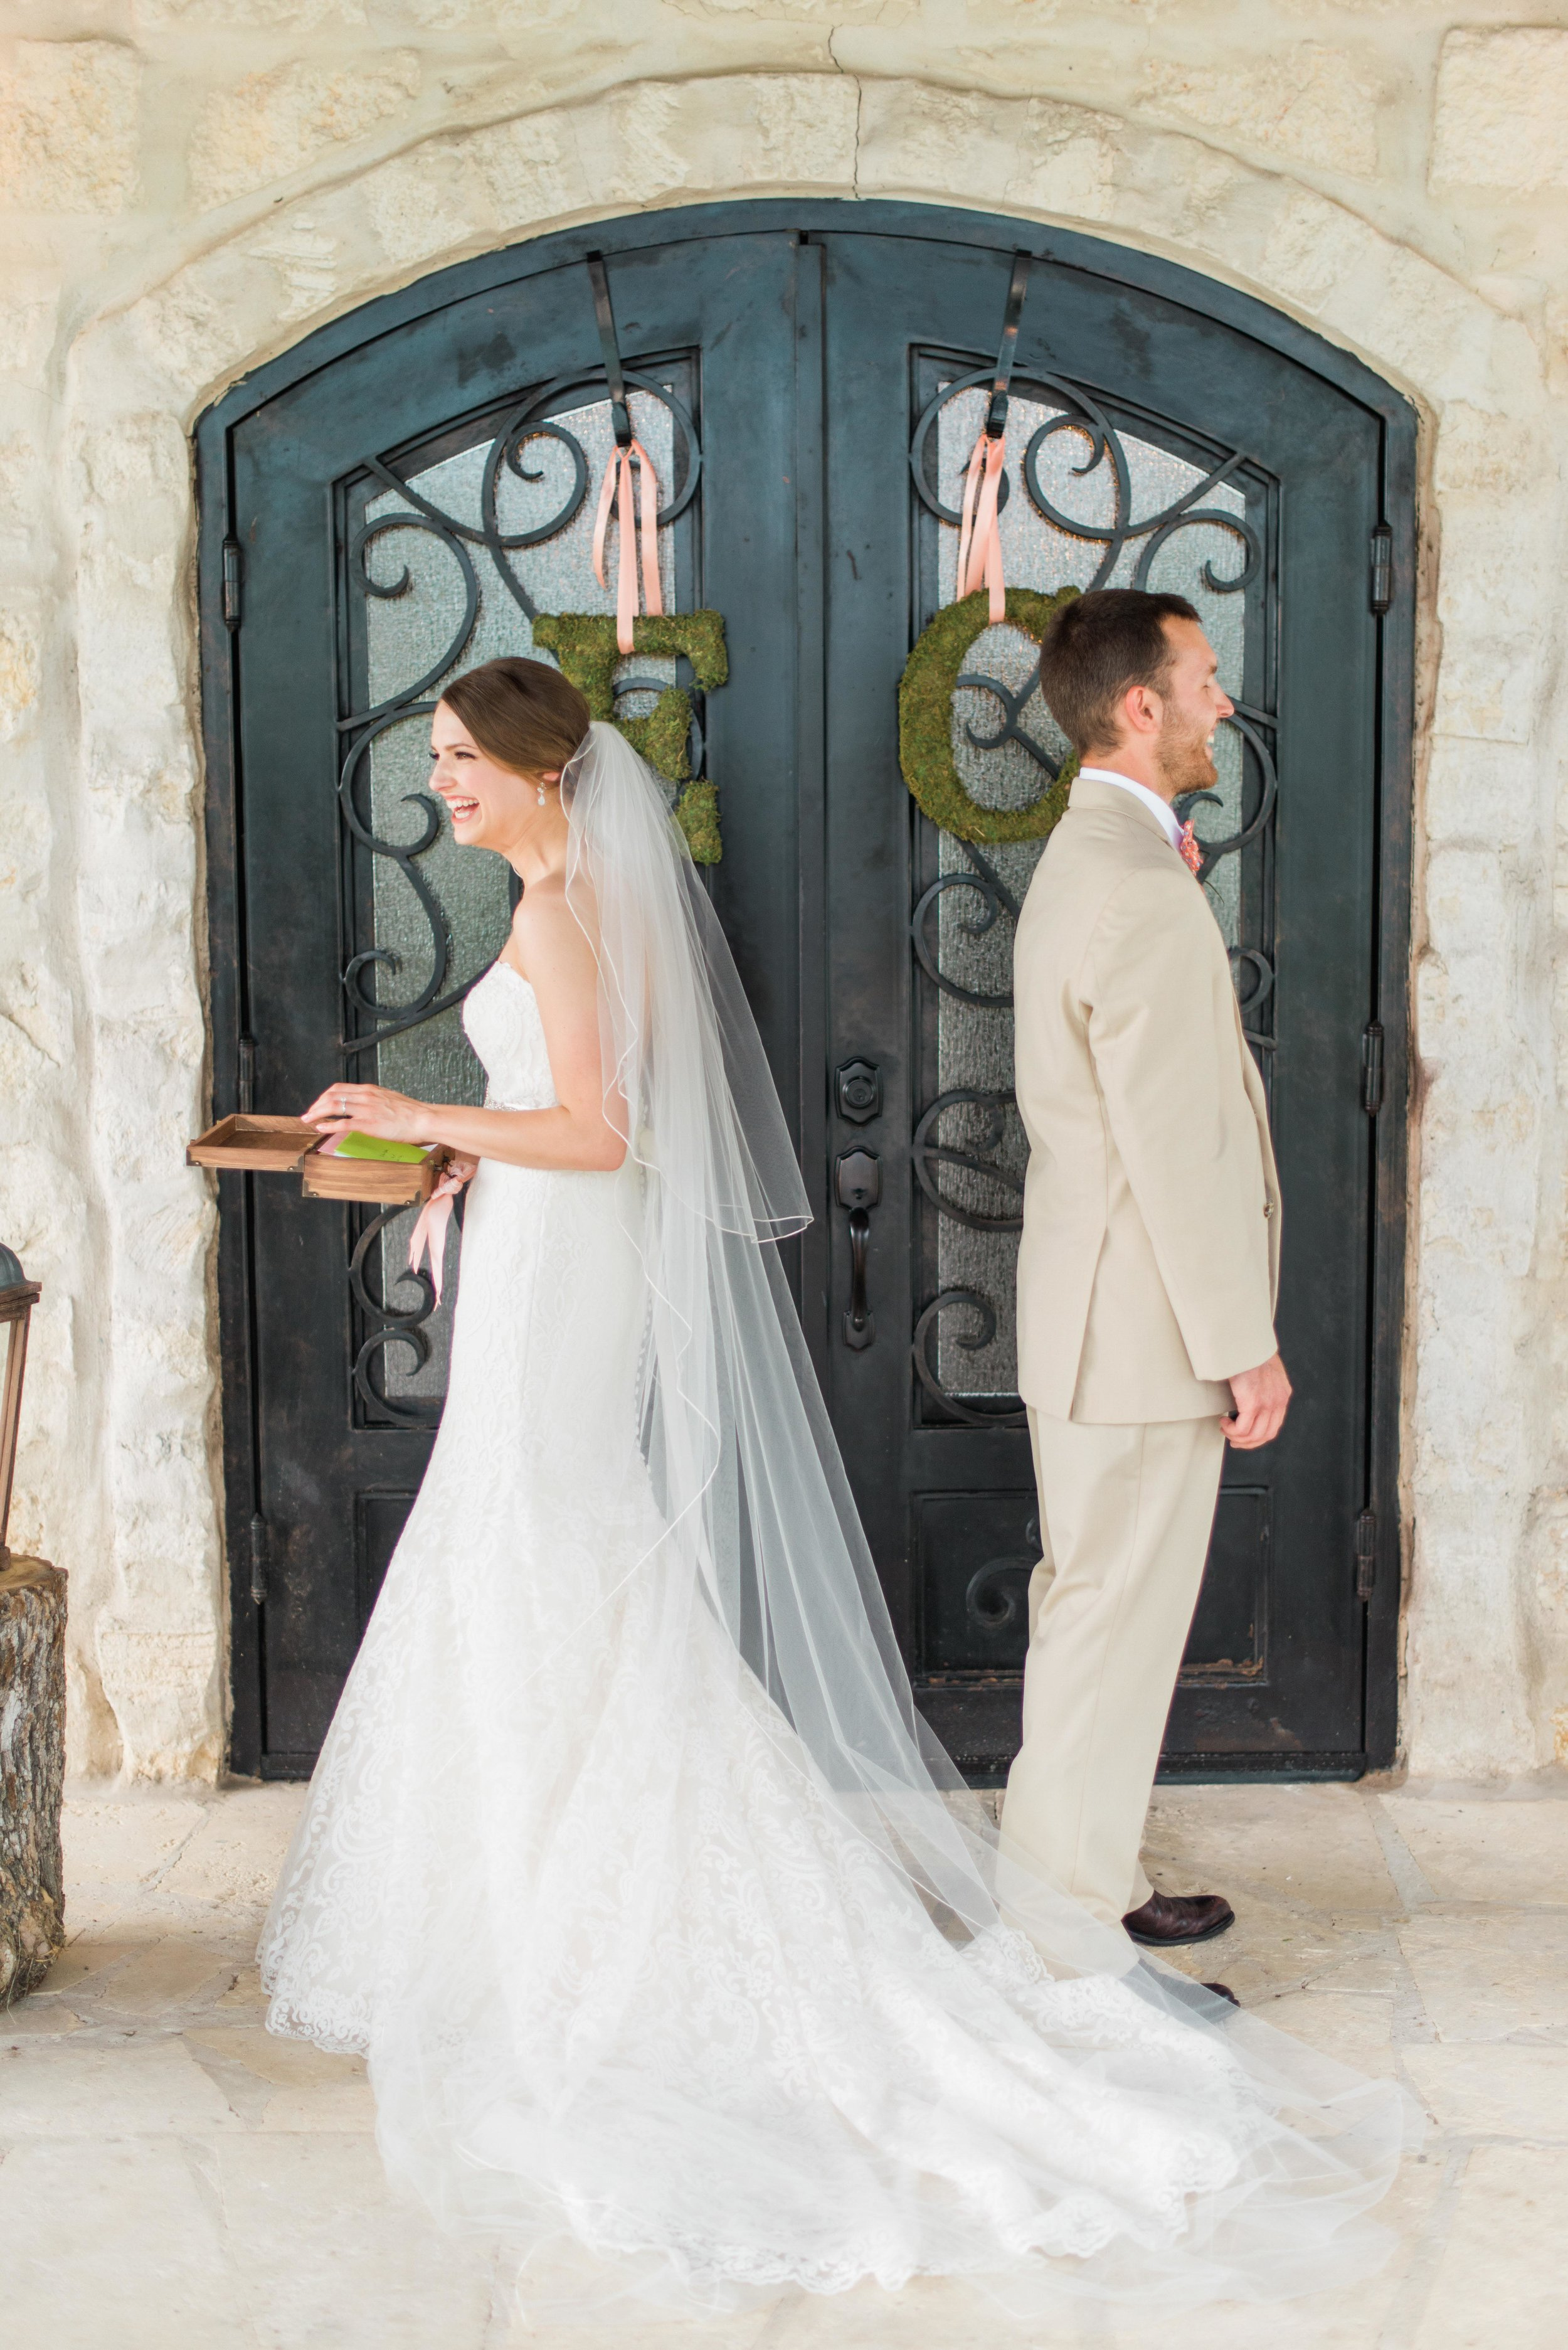 The-Knot-Wedding-Houston-Photographer-Fine-Art-Dana-Fernandez-Photography-Film-21.jpg